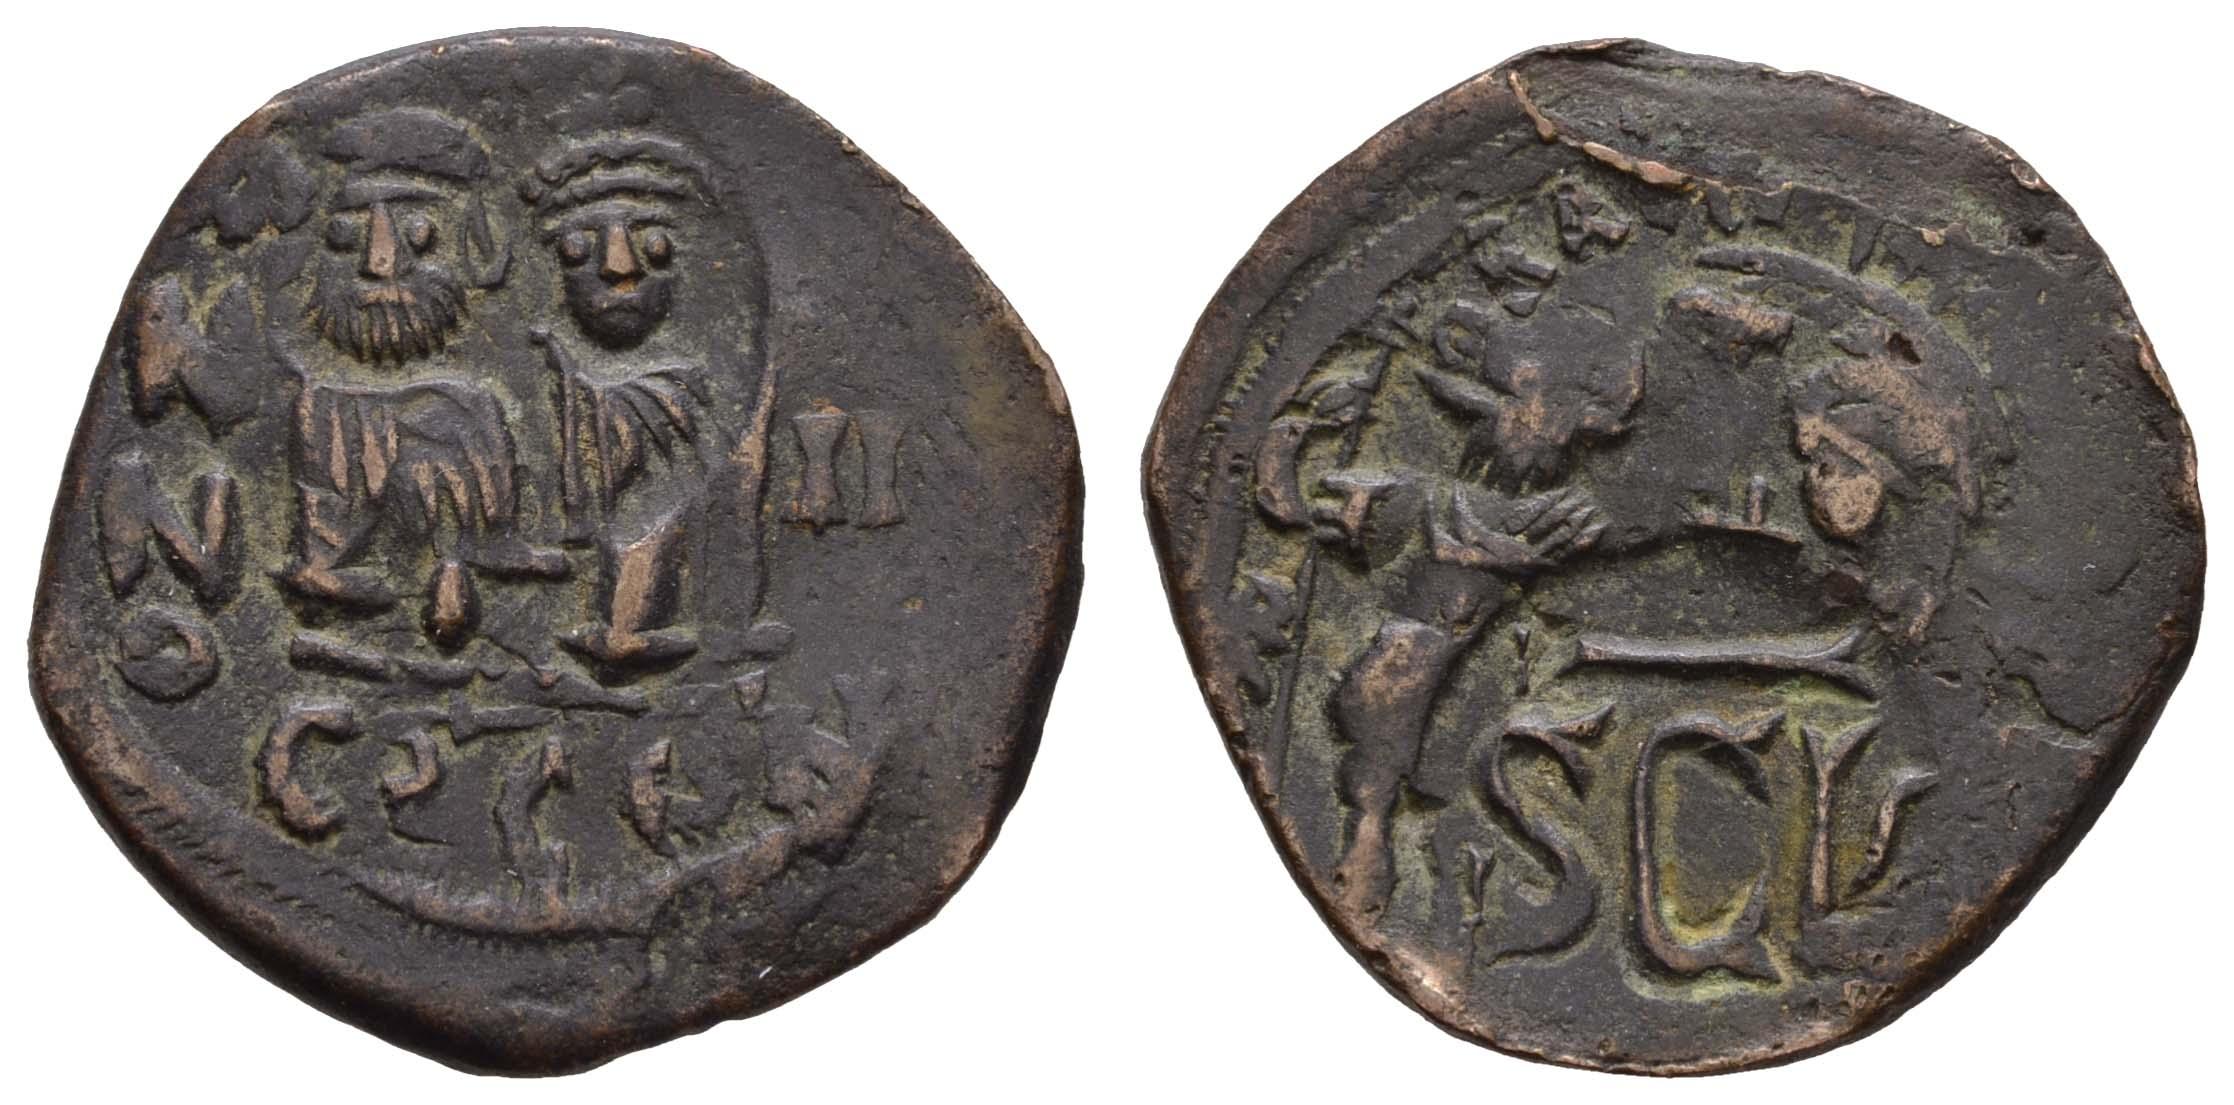 Lot 359 - Antike Byzanz -  Auktionshaus Ulrich Felzmann GmbH & Co. KG Coins single lots